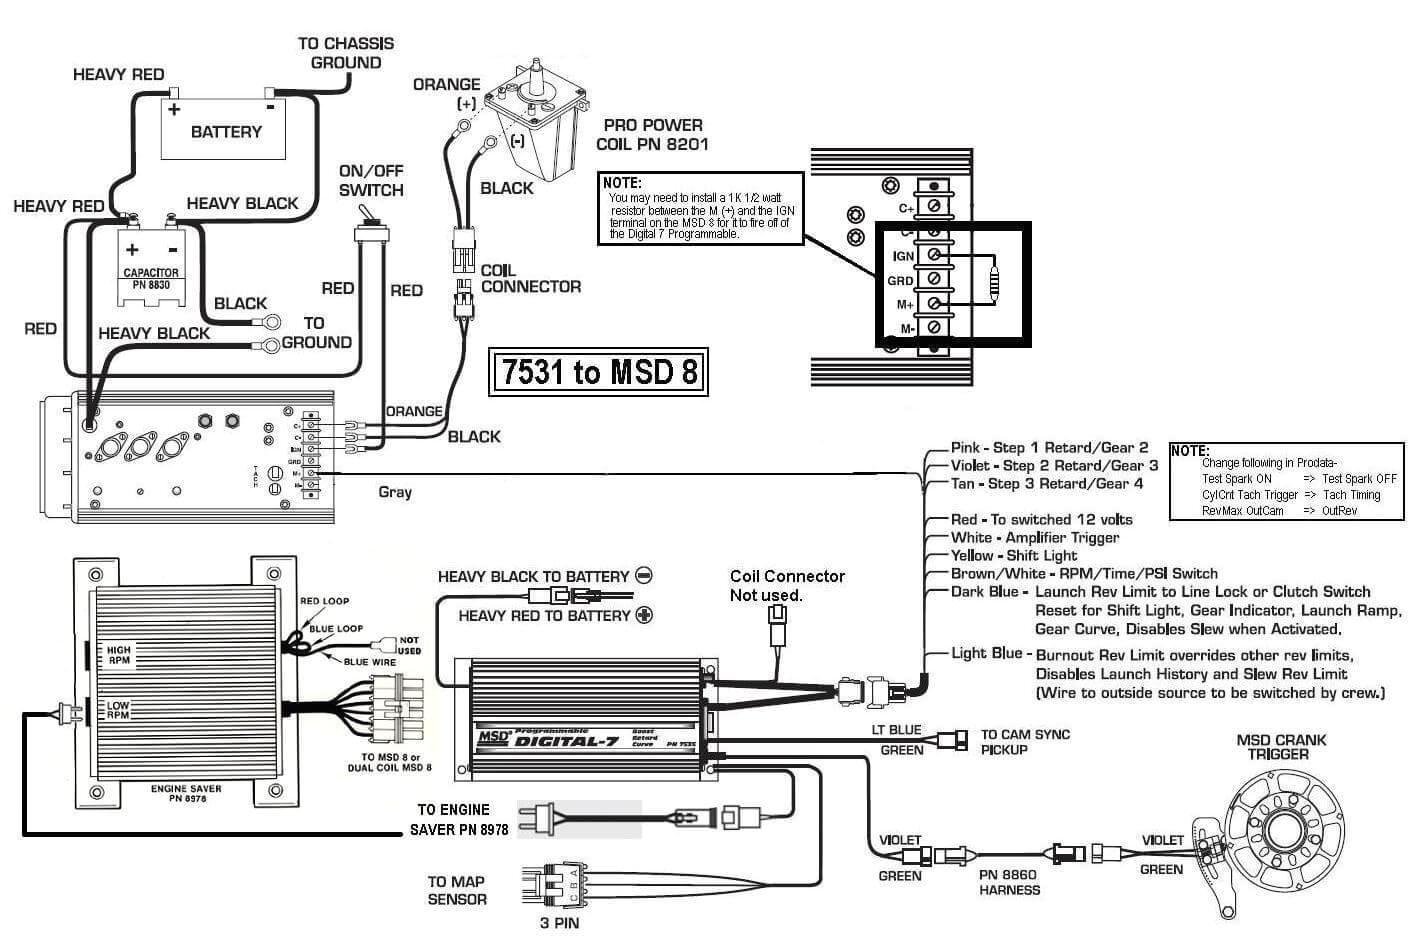 msd digital 7 wiring diagram use wiring diagram msd digital 7 programmable wiring diagram msd digital 7 wiring diagram